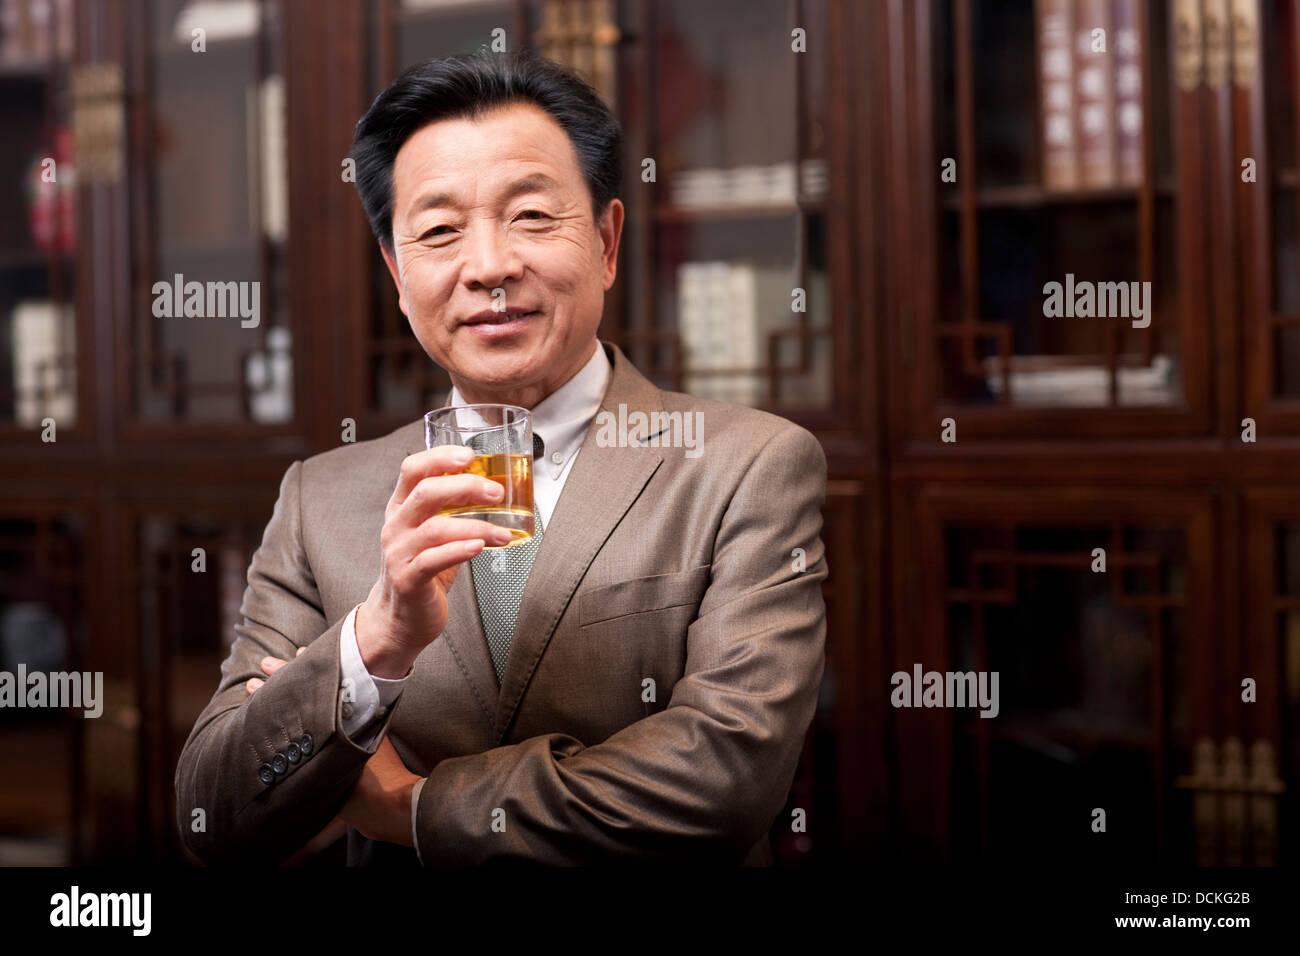 Successful businessman enjoying wine Stock Photo